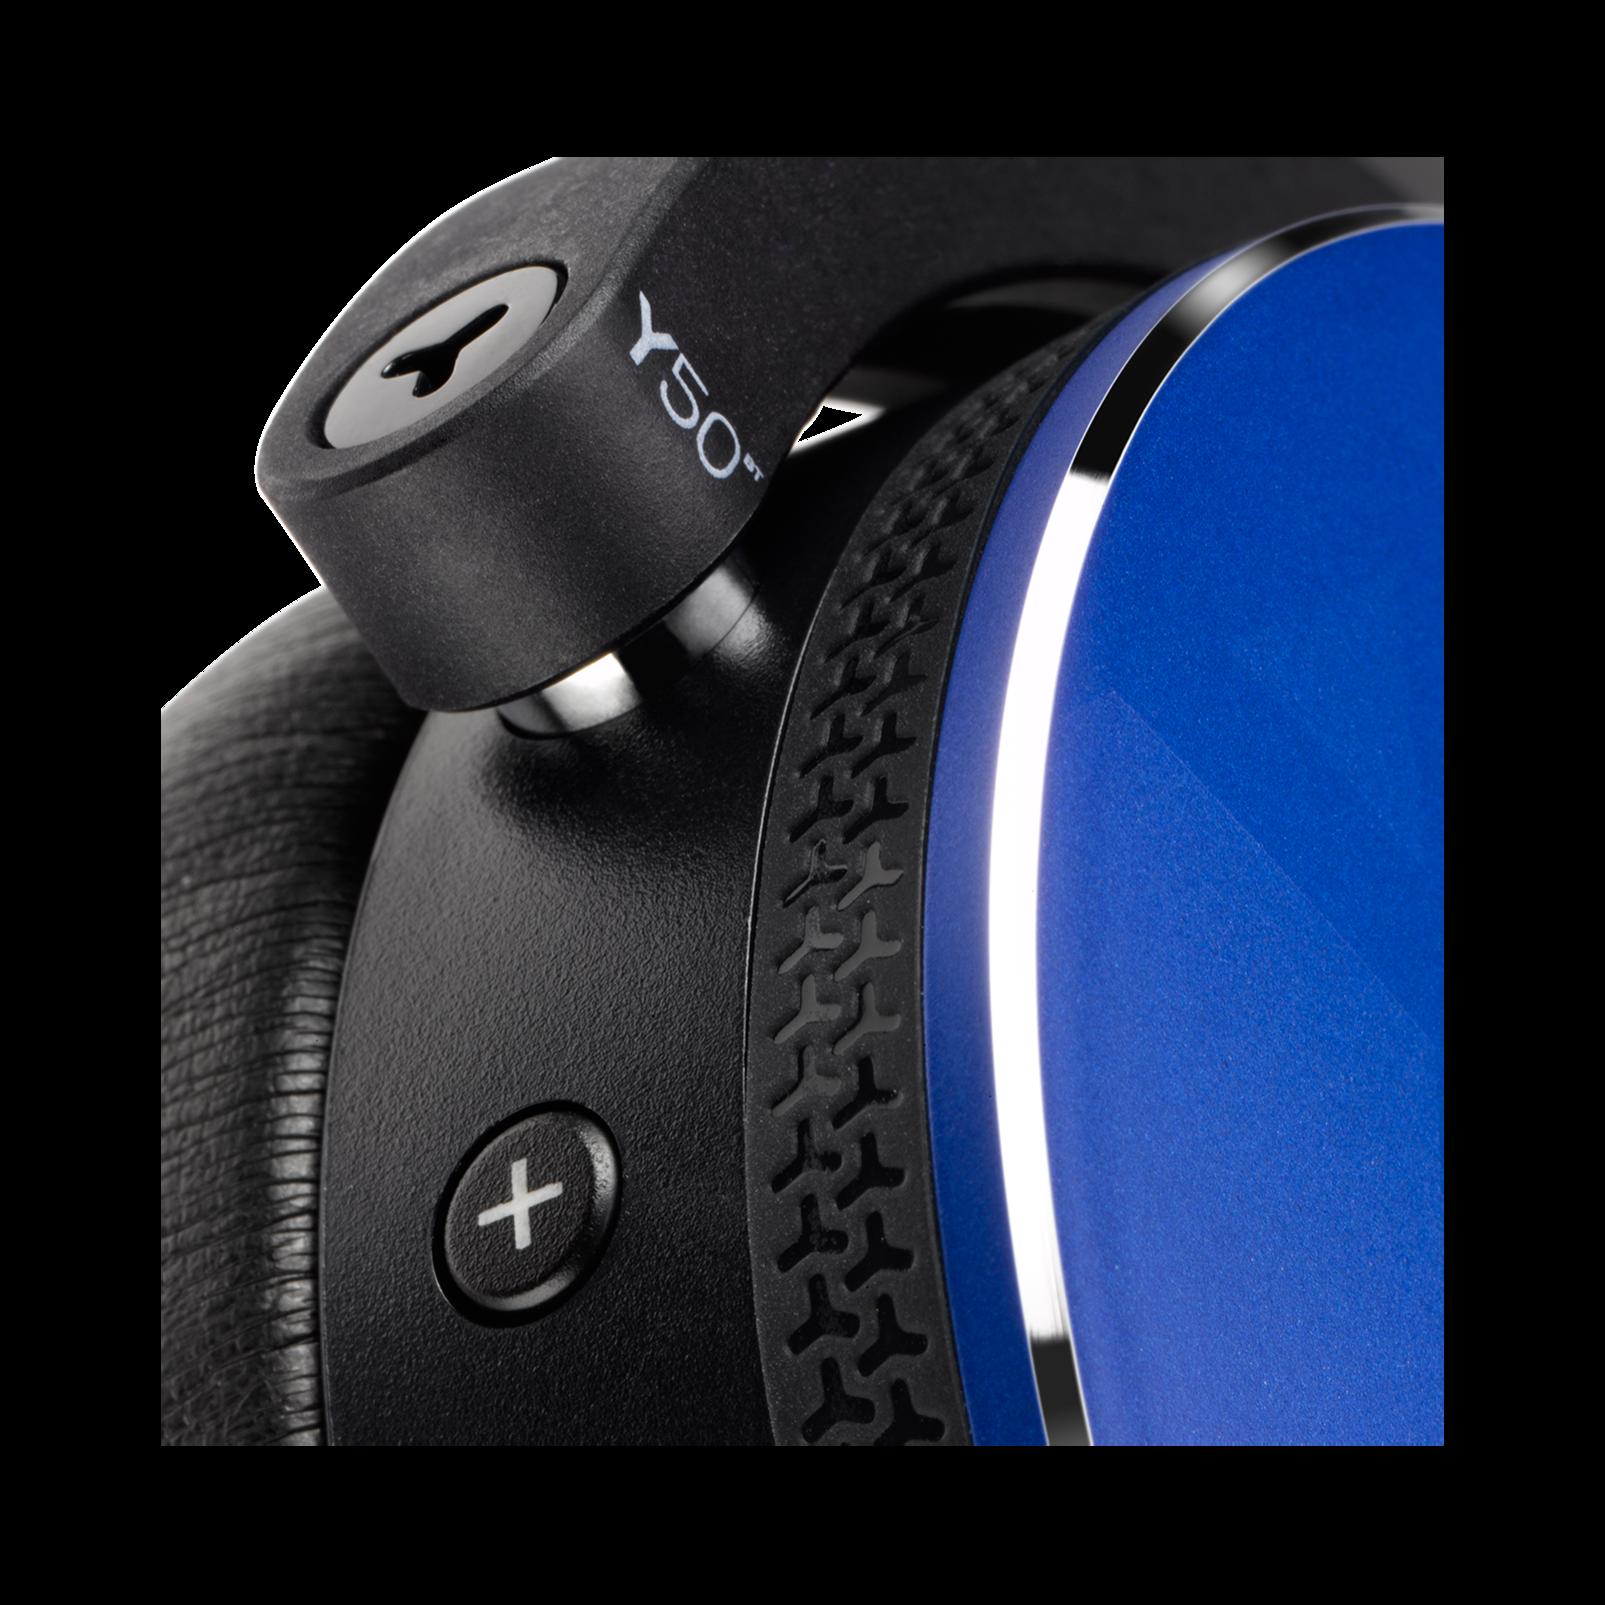 Y50BT - Blue - Premium portable Bluetooth speaker with quad microphone conferencing system - Detailshot 2